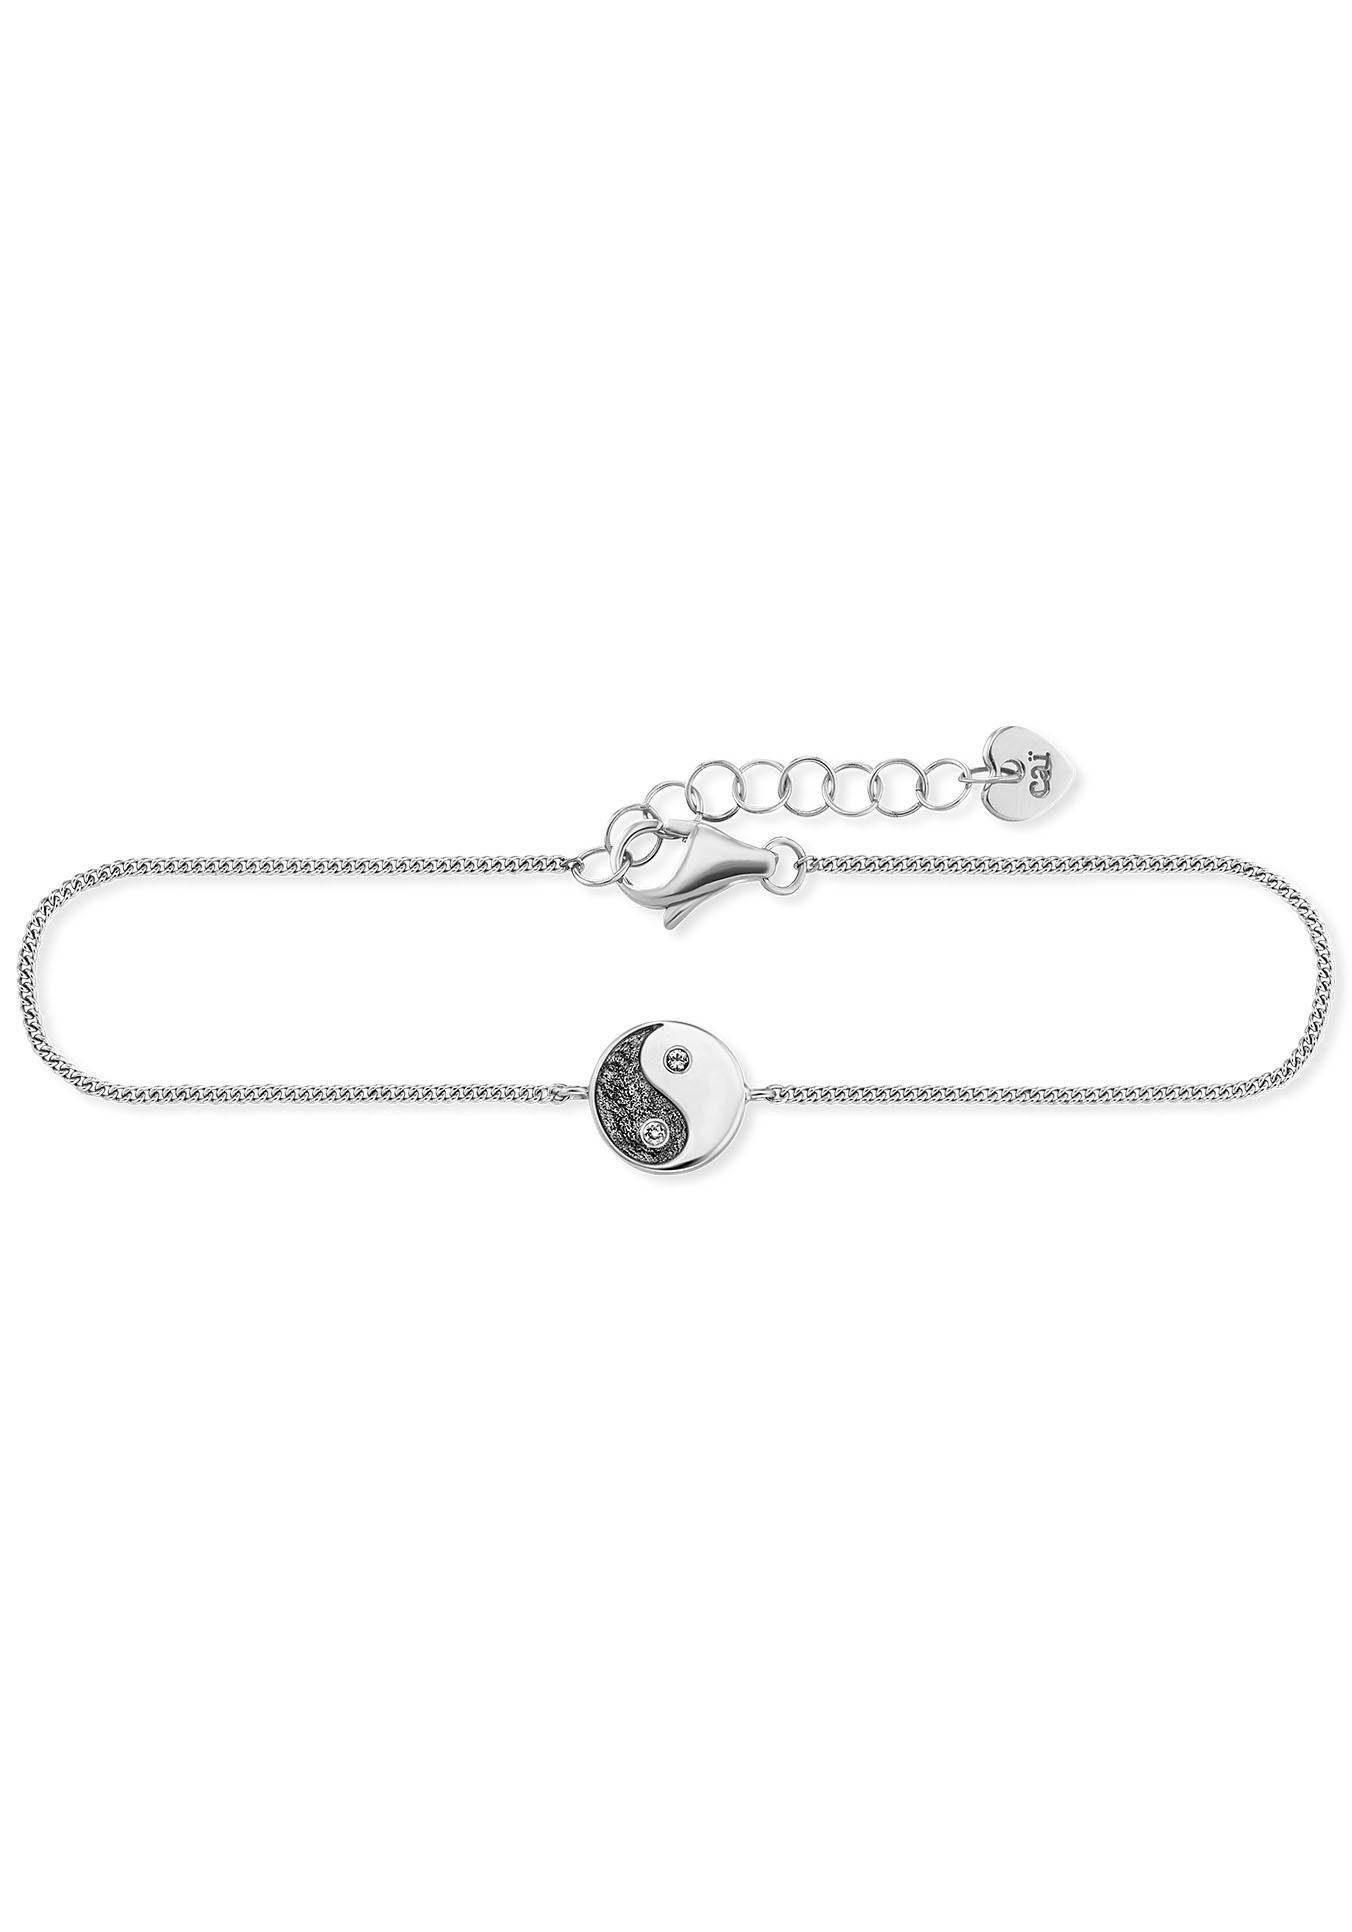 CAÏ Silberarmband »caï love, Ying Yang, C7402B/90/CG/19« mit Zirkonia